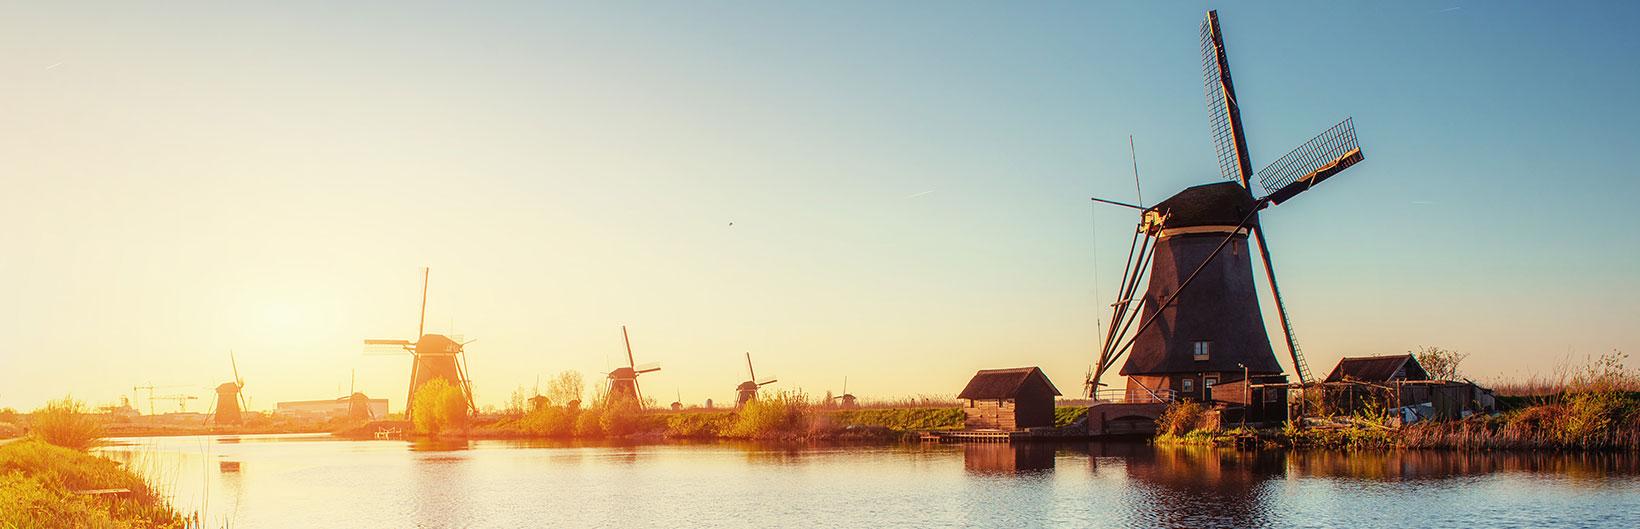 Steuerberatung_Niederlande